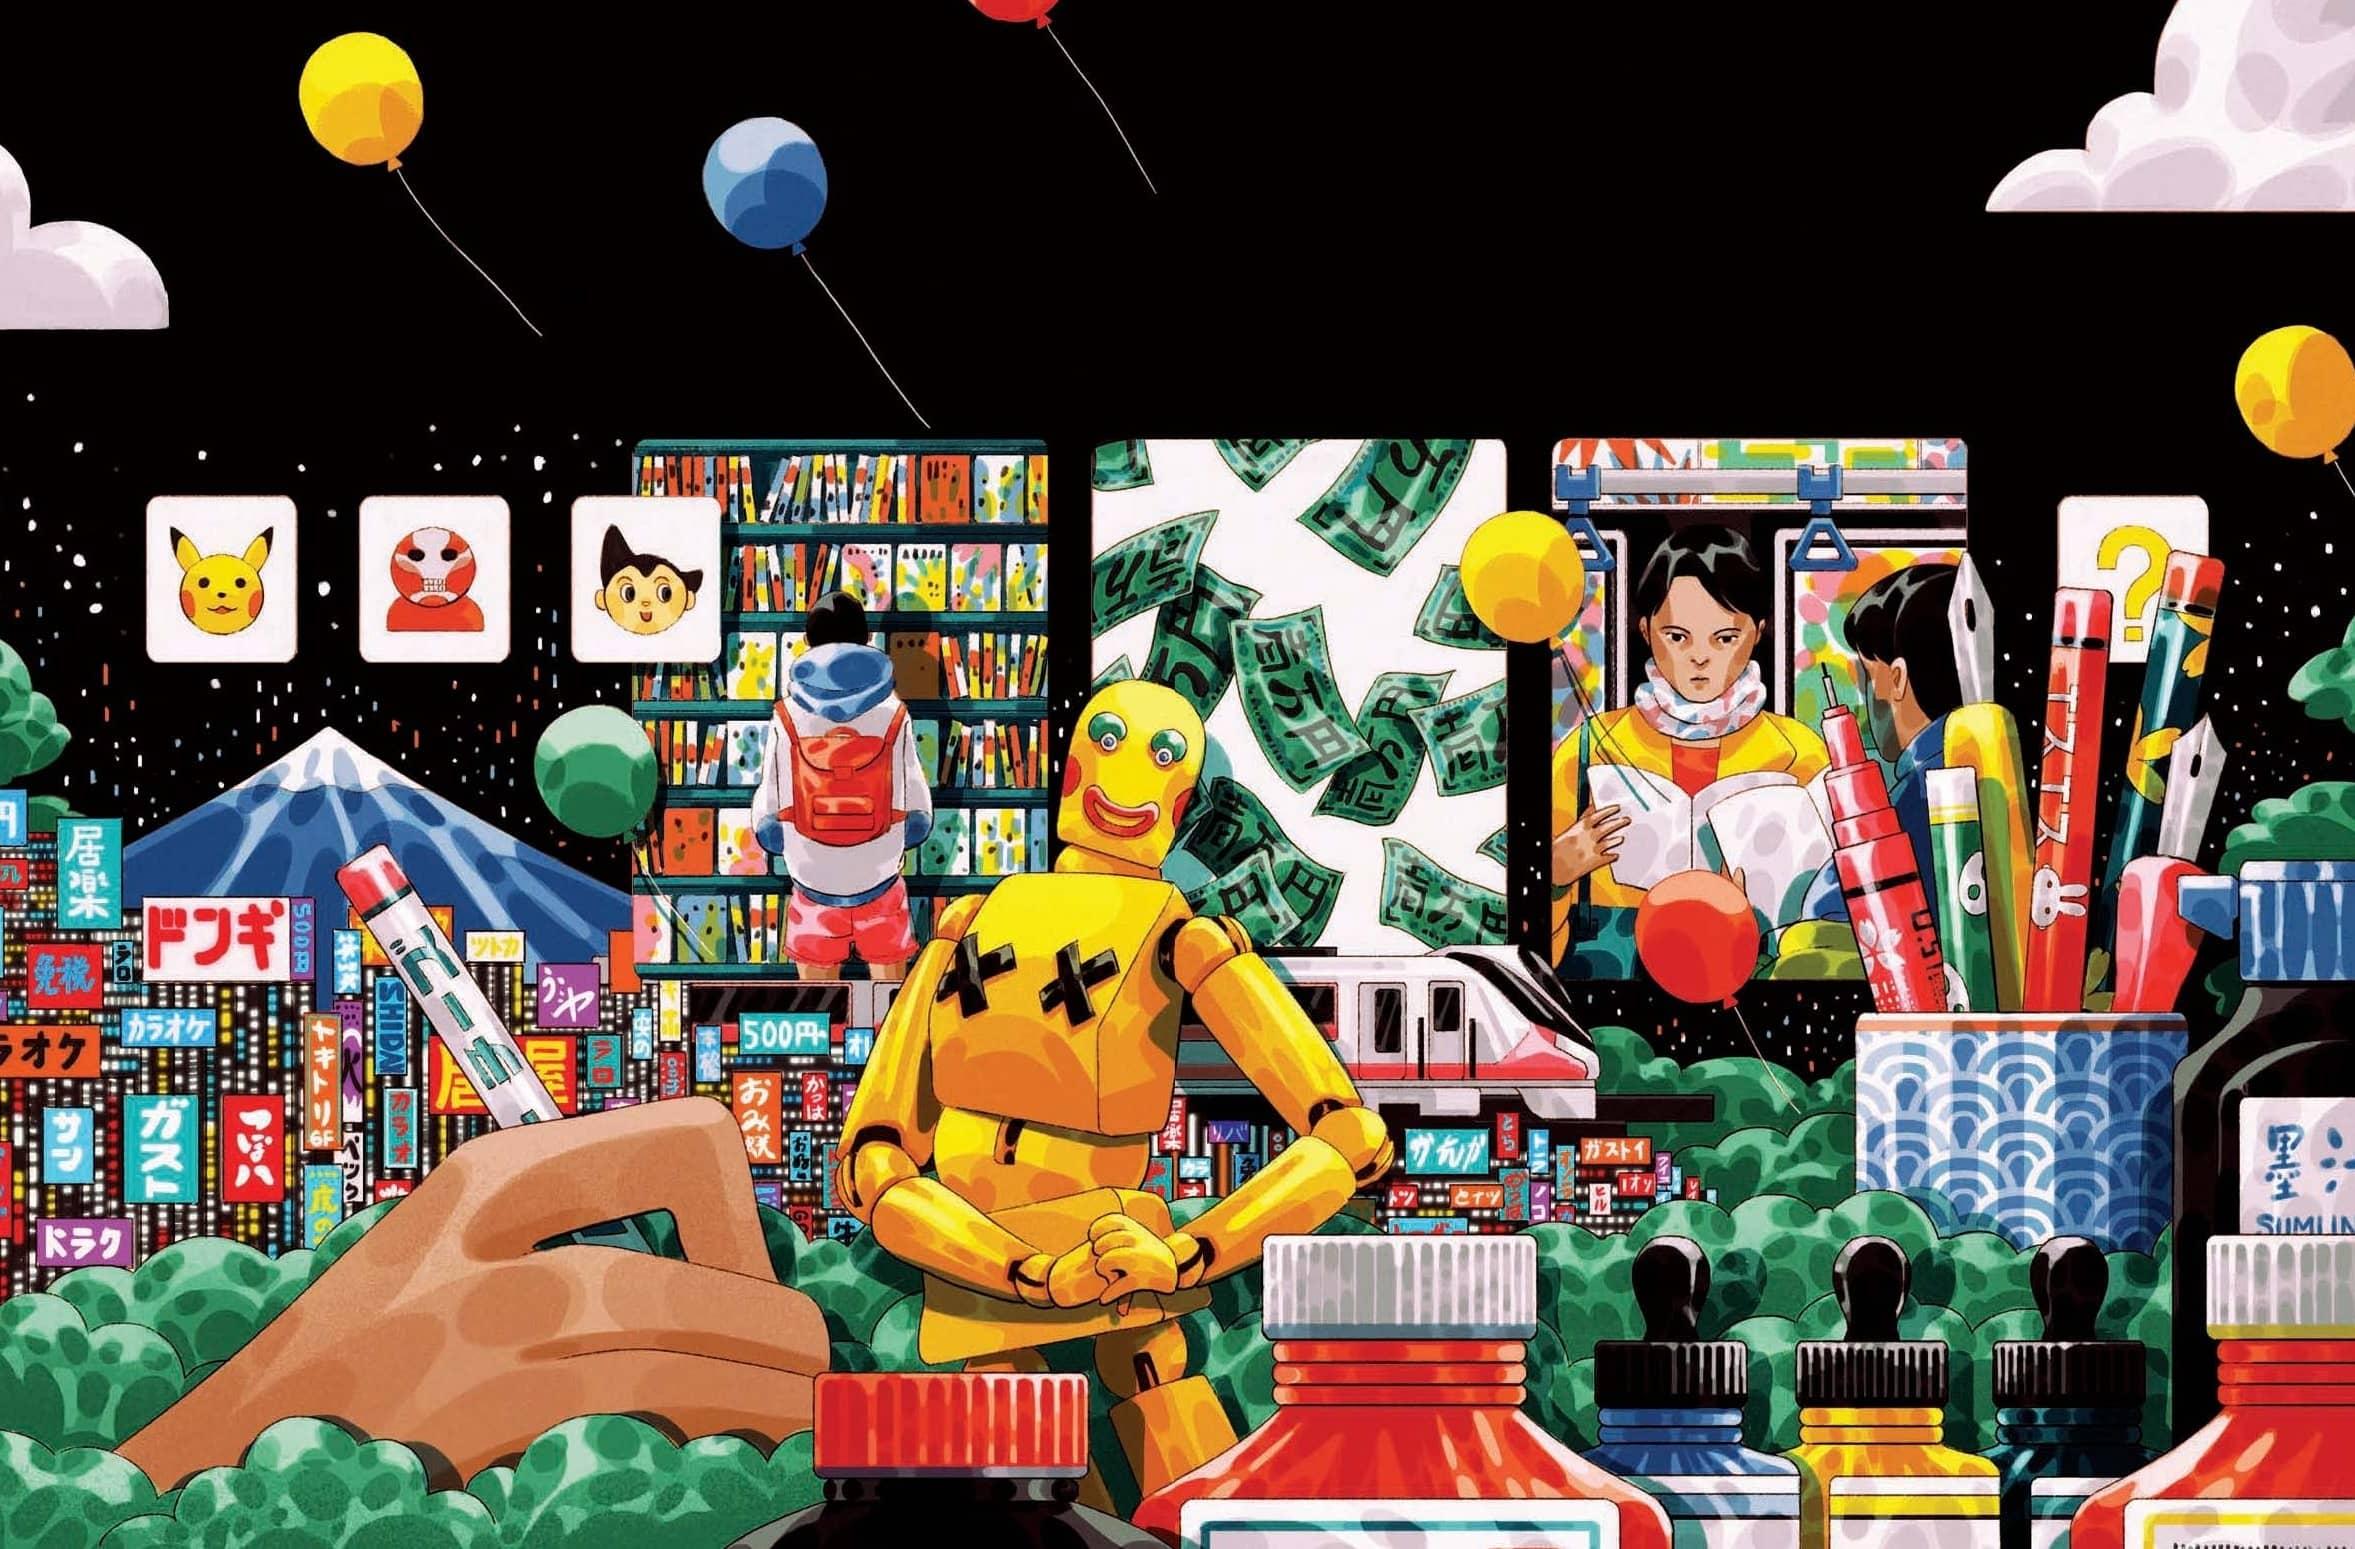 Japan's Next Top Comic Book Artist